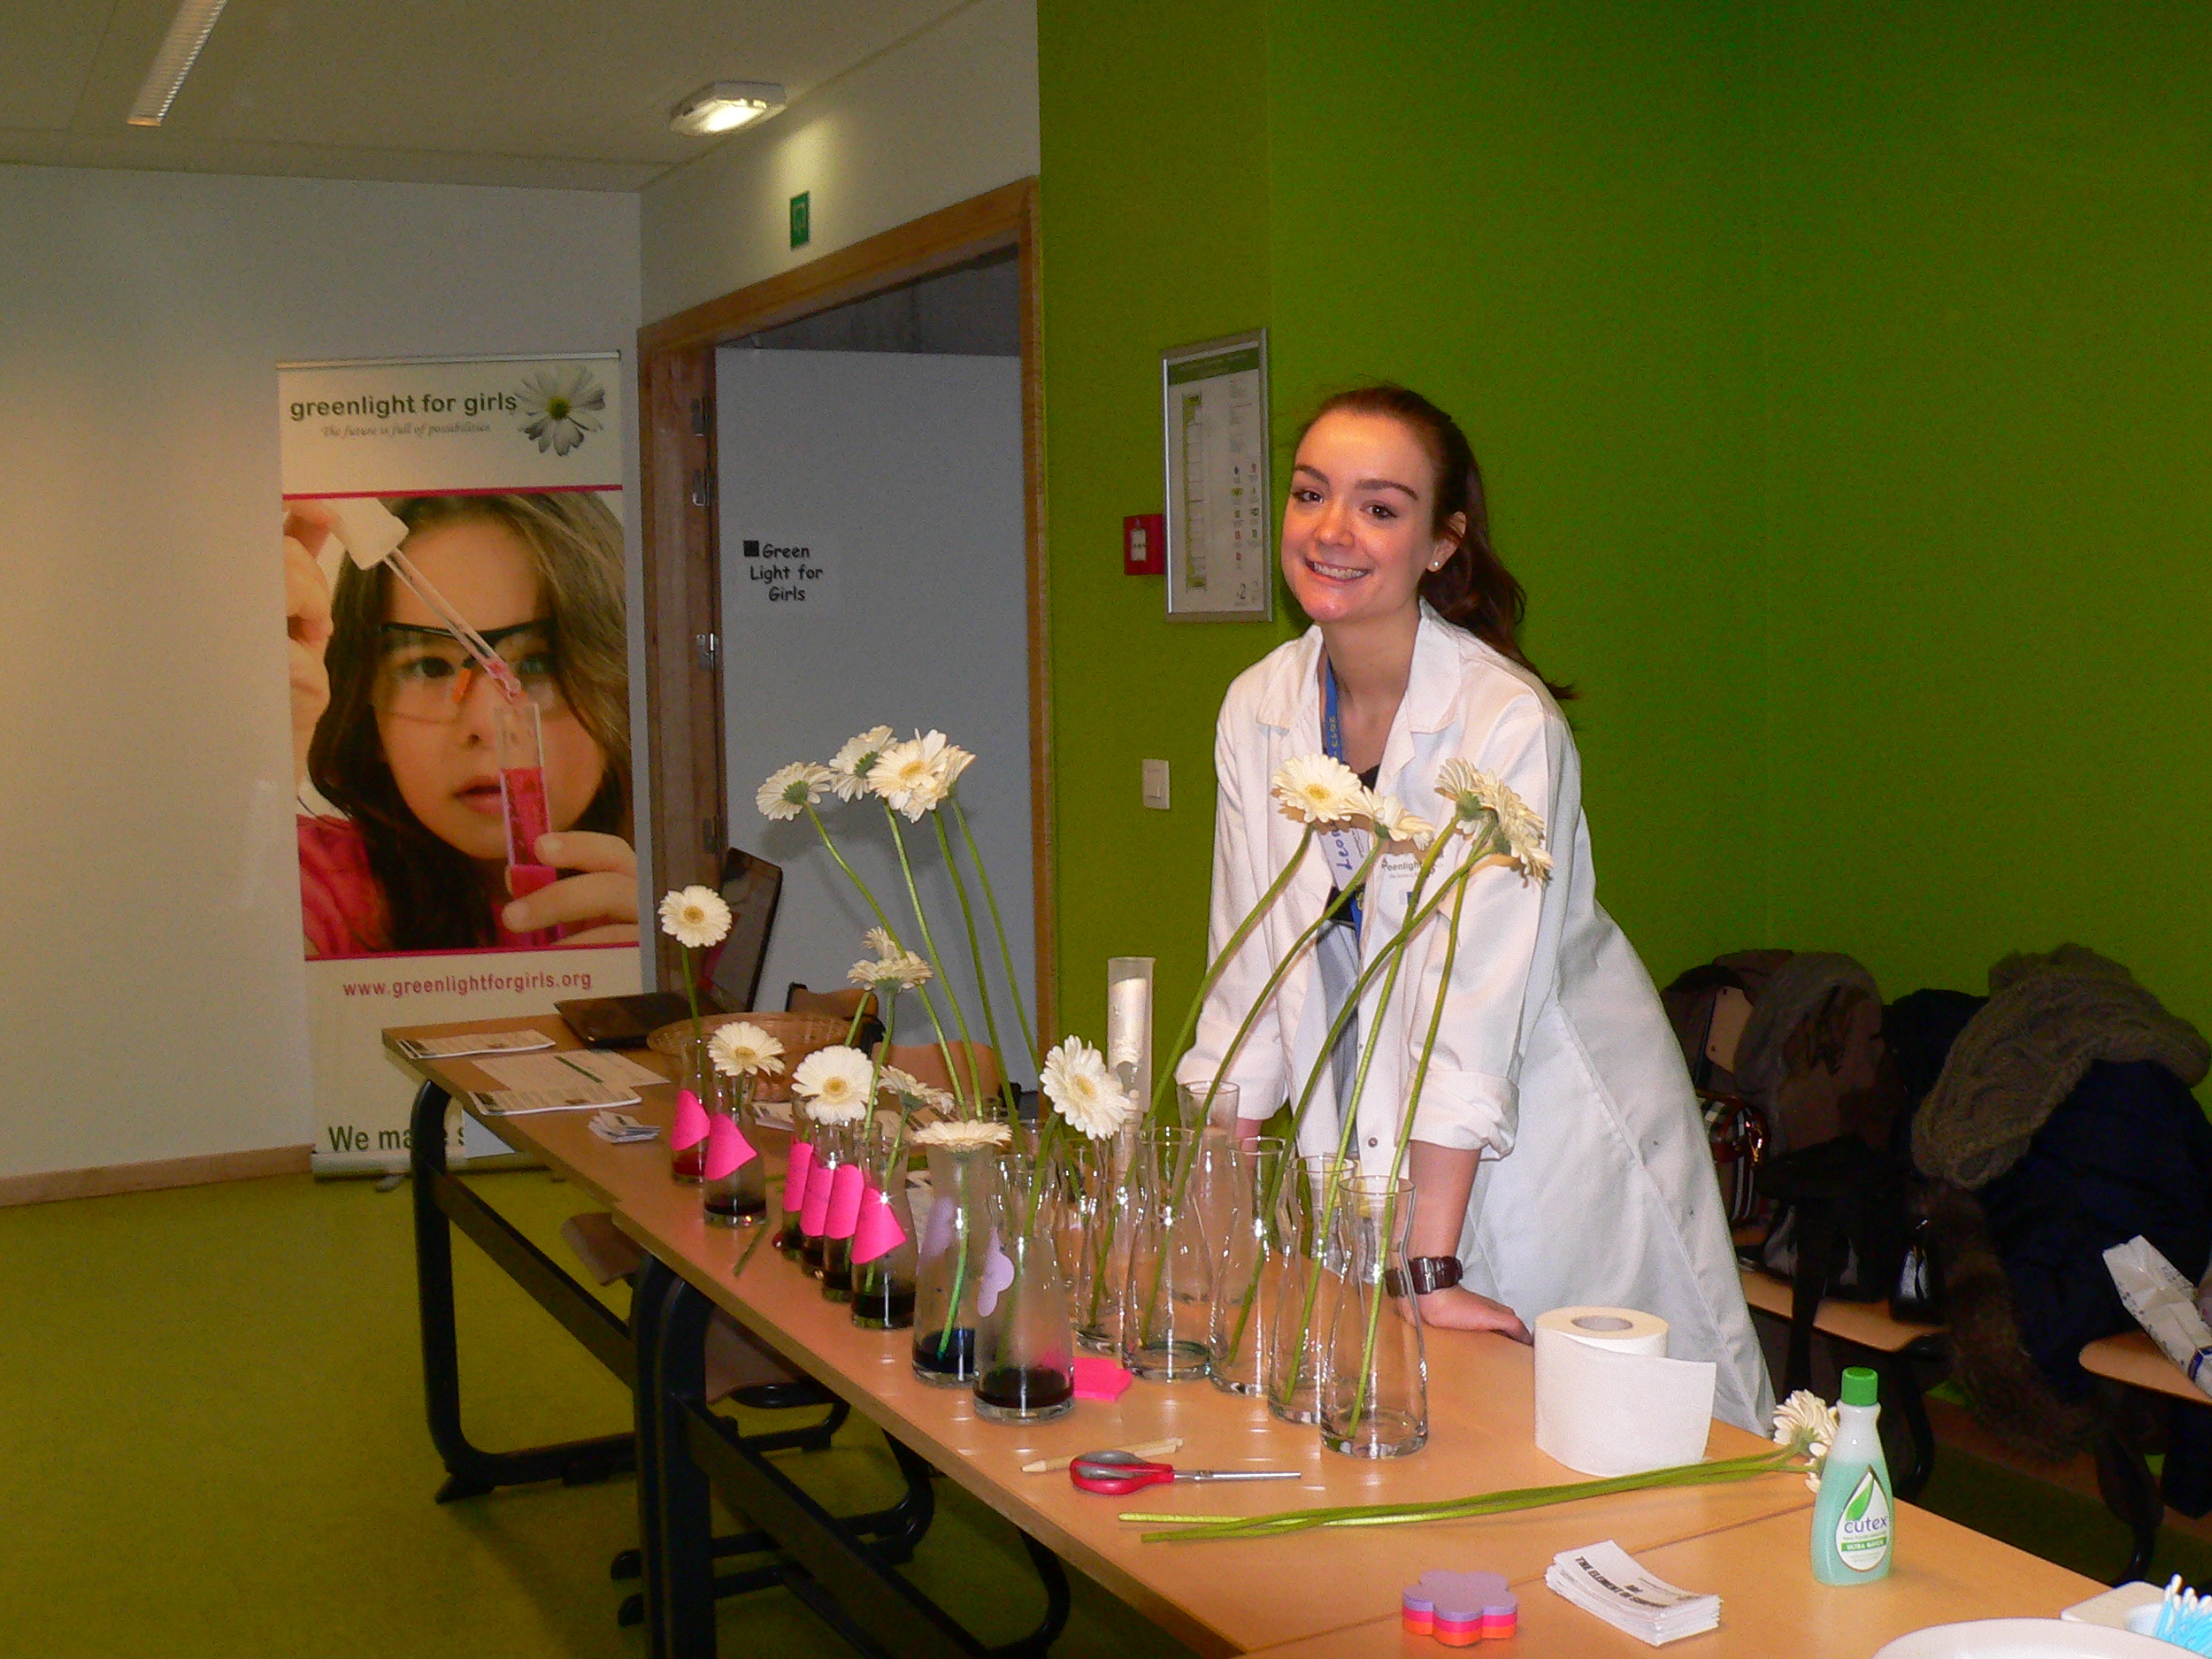 g4g - EU School Science Symposium 2013 (2).JPG